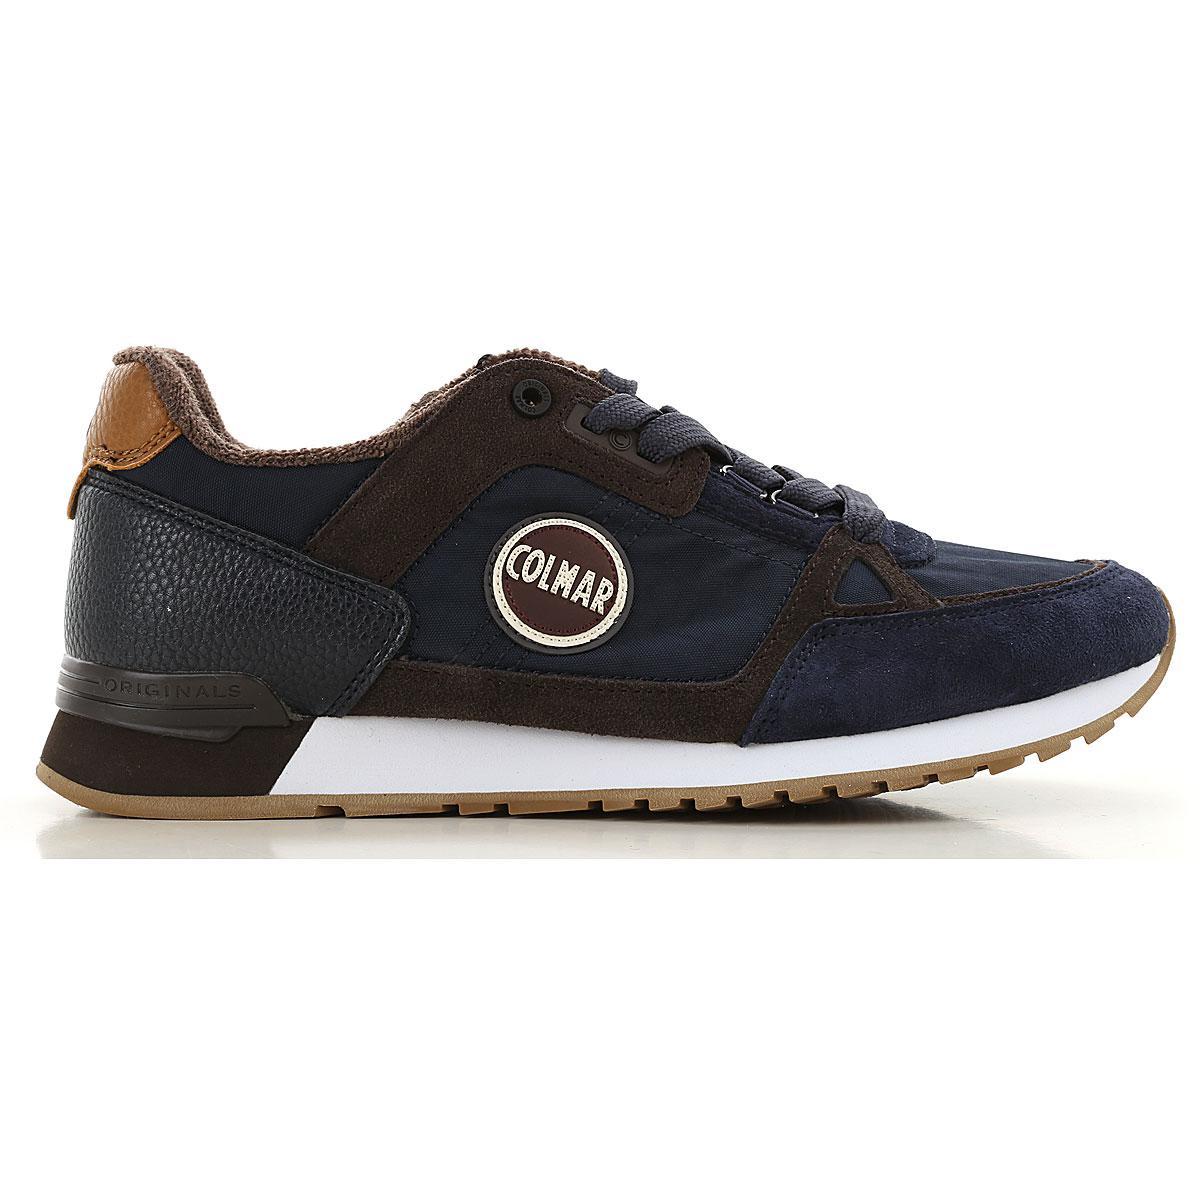 For For For Men Lyst Sneakers Blue for Men in in in in Colmar Enn01HqwU